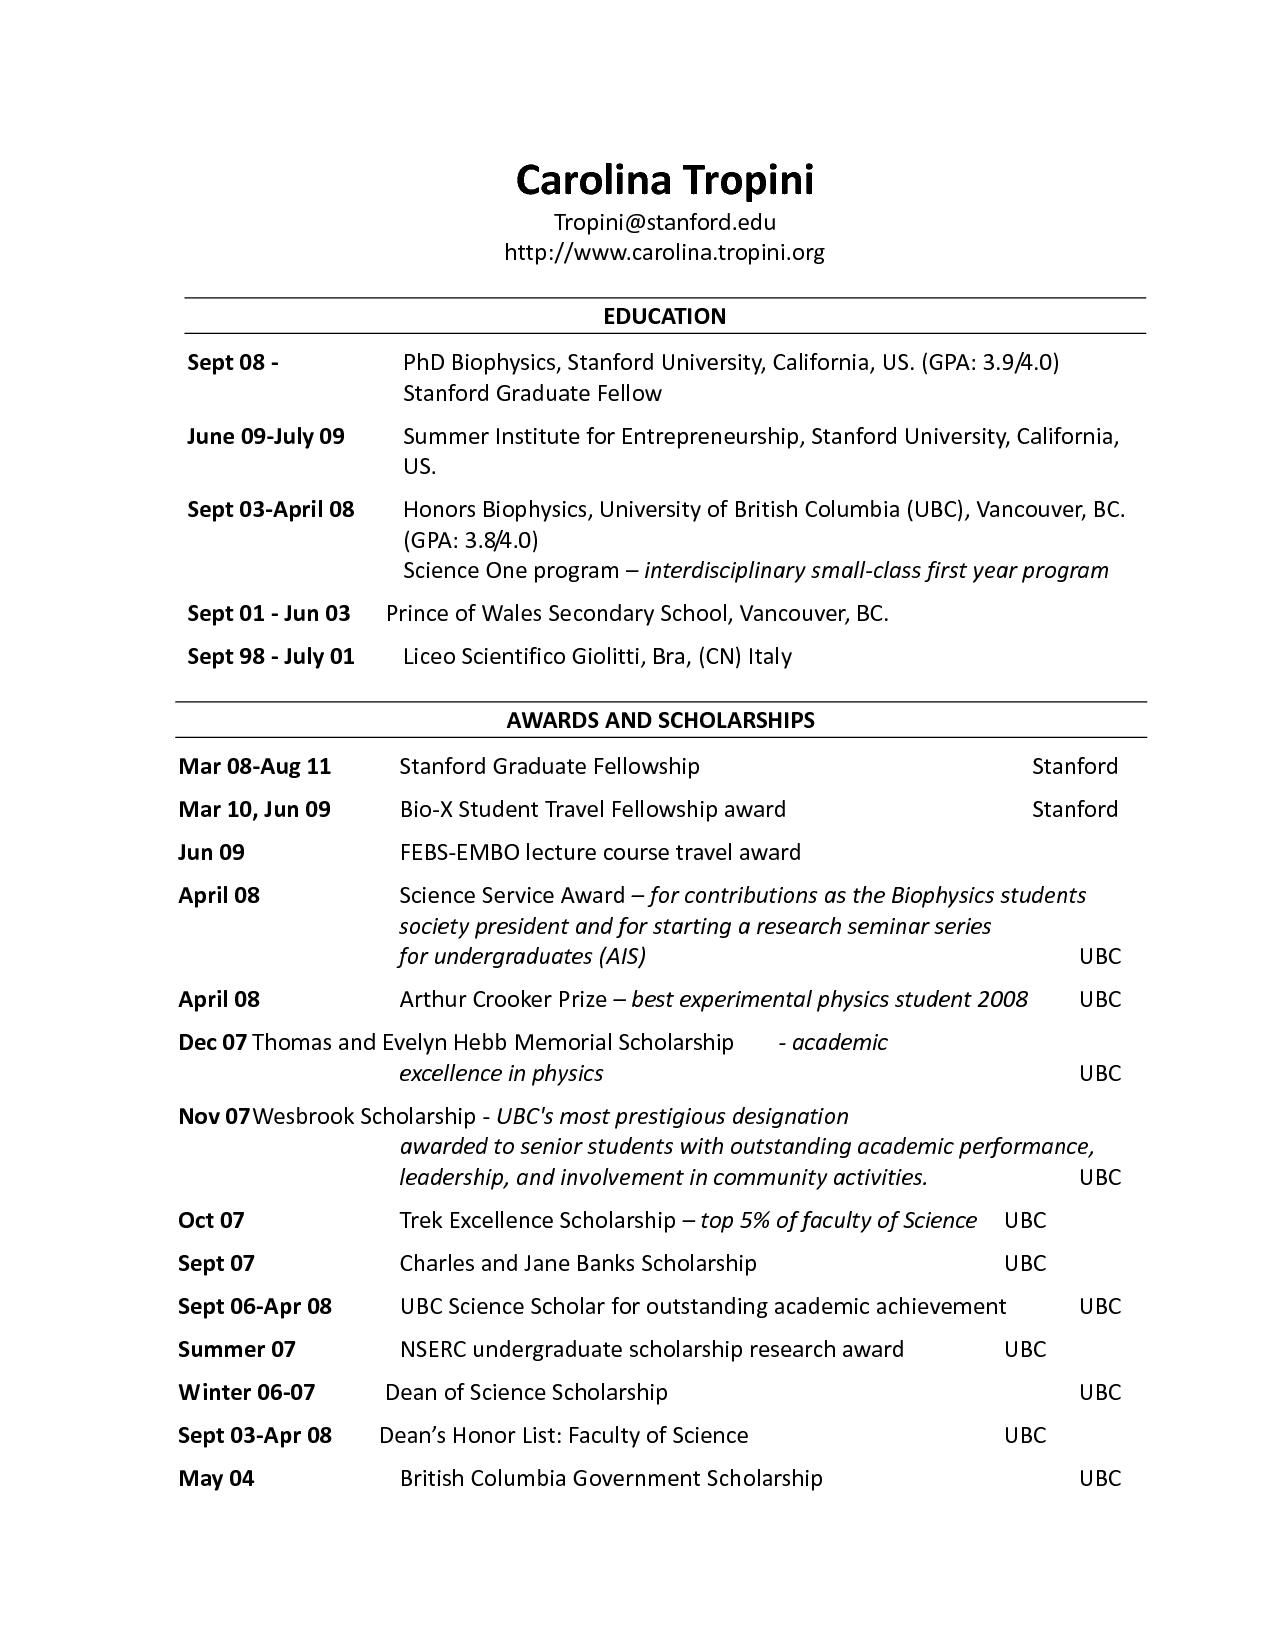 resume template heading  17 Resume Header Designs Images - Professional Resume ..